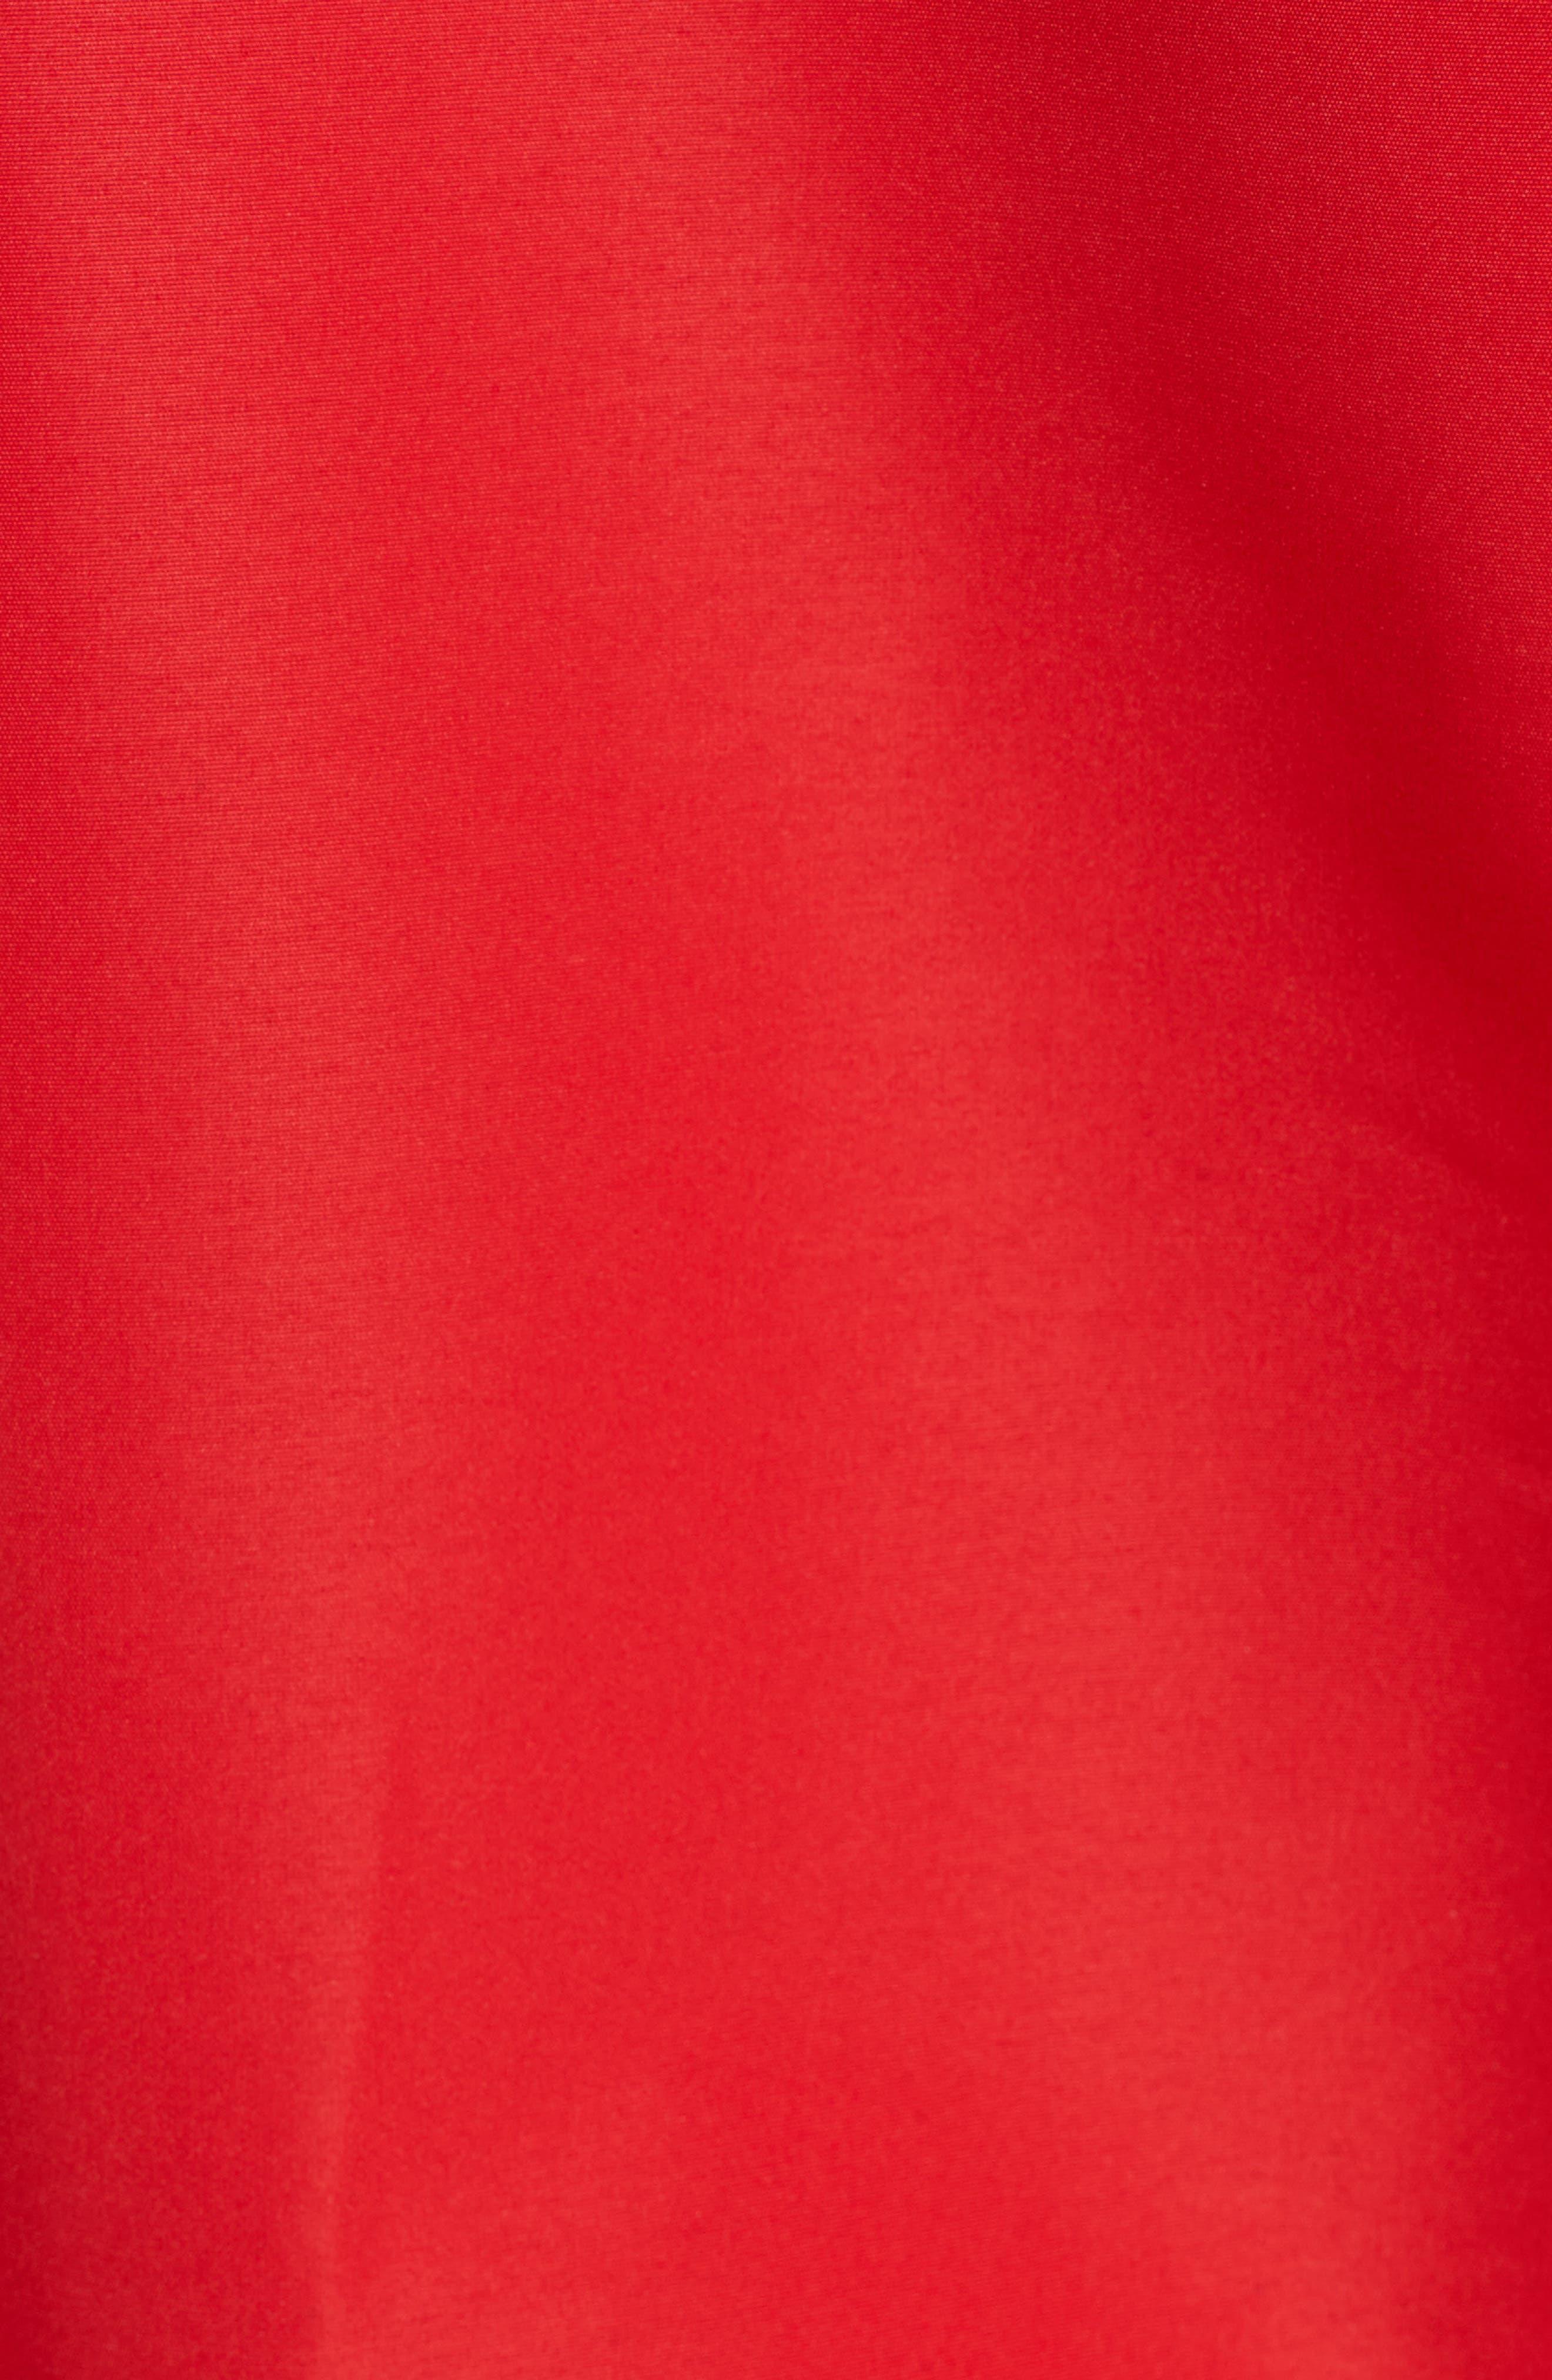 Eyes Lightweight Jacket,                             Alternate thumbnail 7, color,                             HOT RED